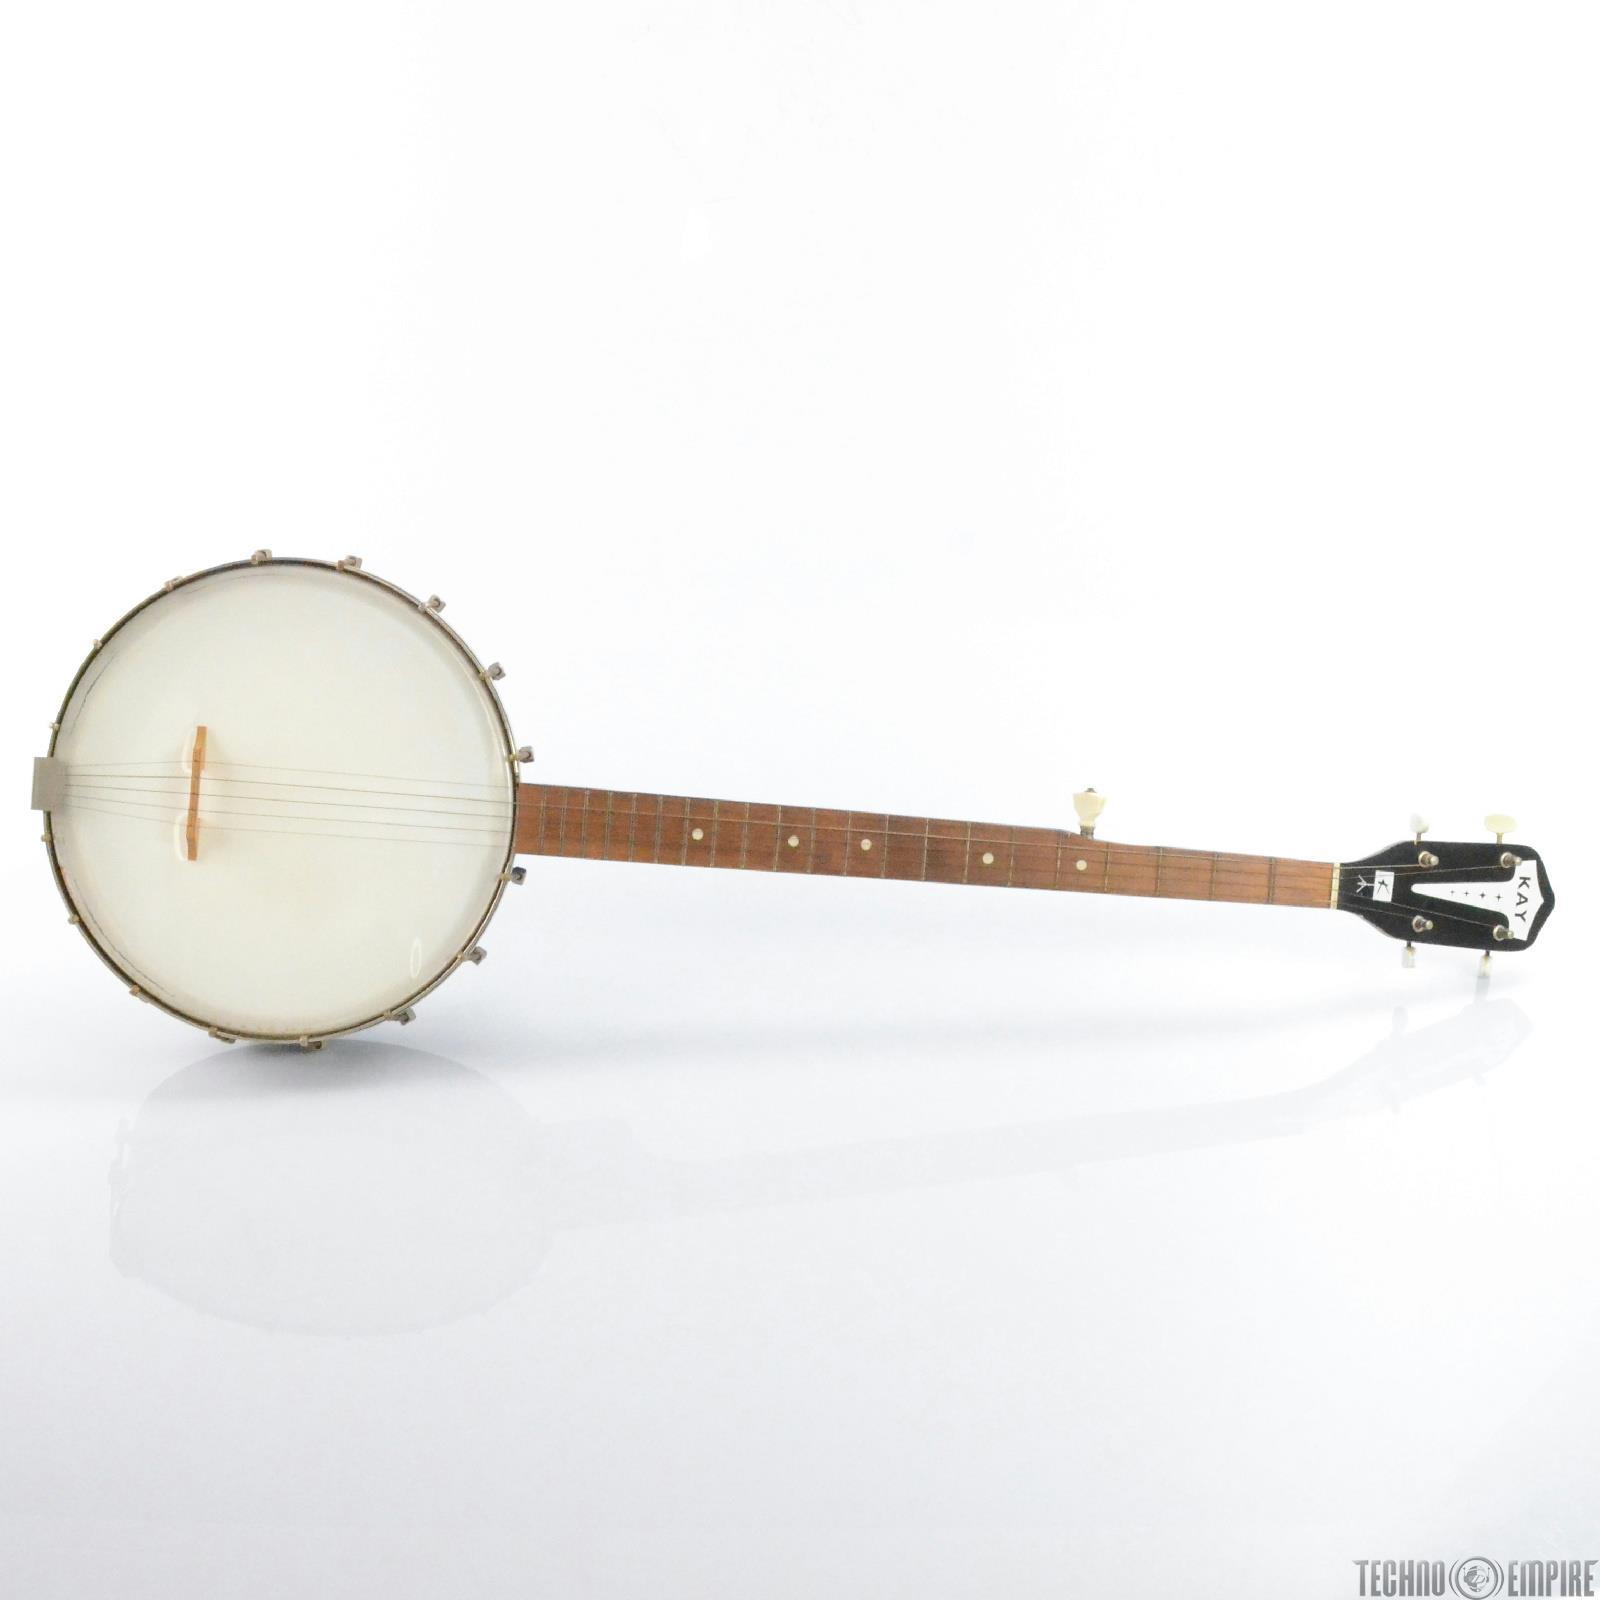 1960s Kay 5-String Open Back Banjo Acoustic Folk Instrument #29813